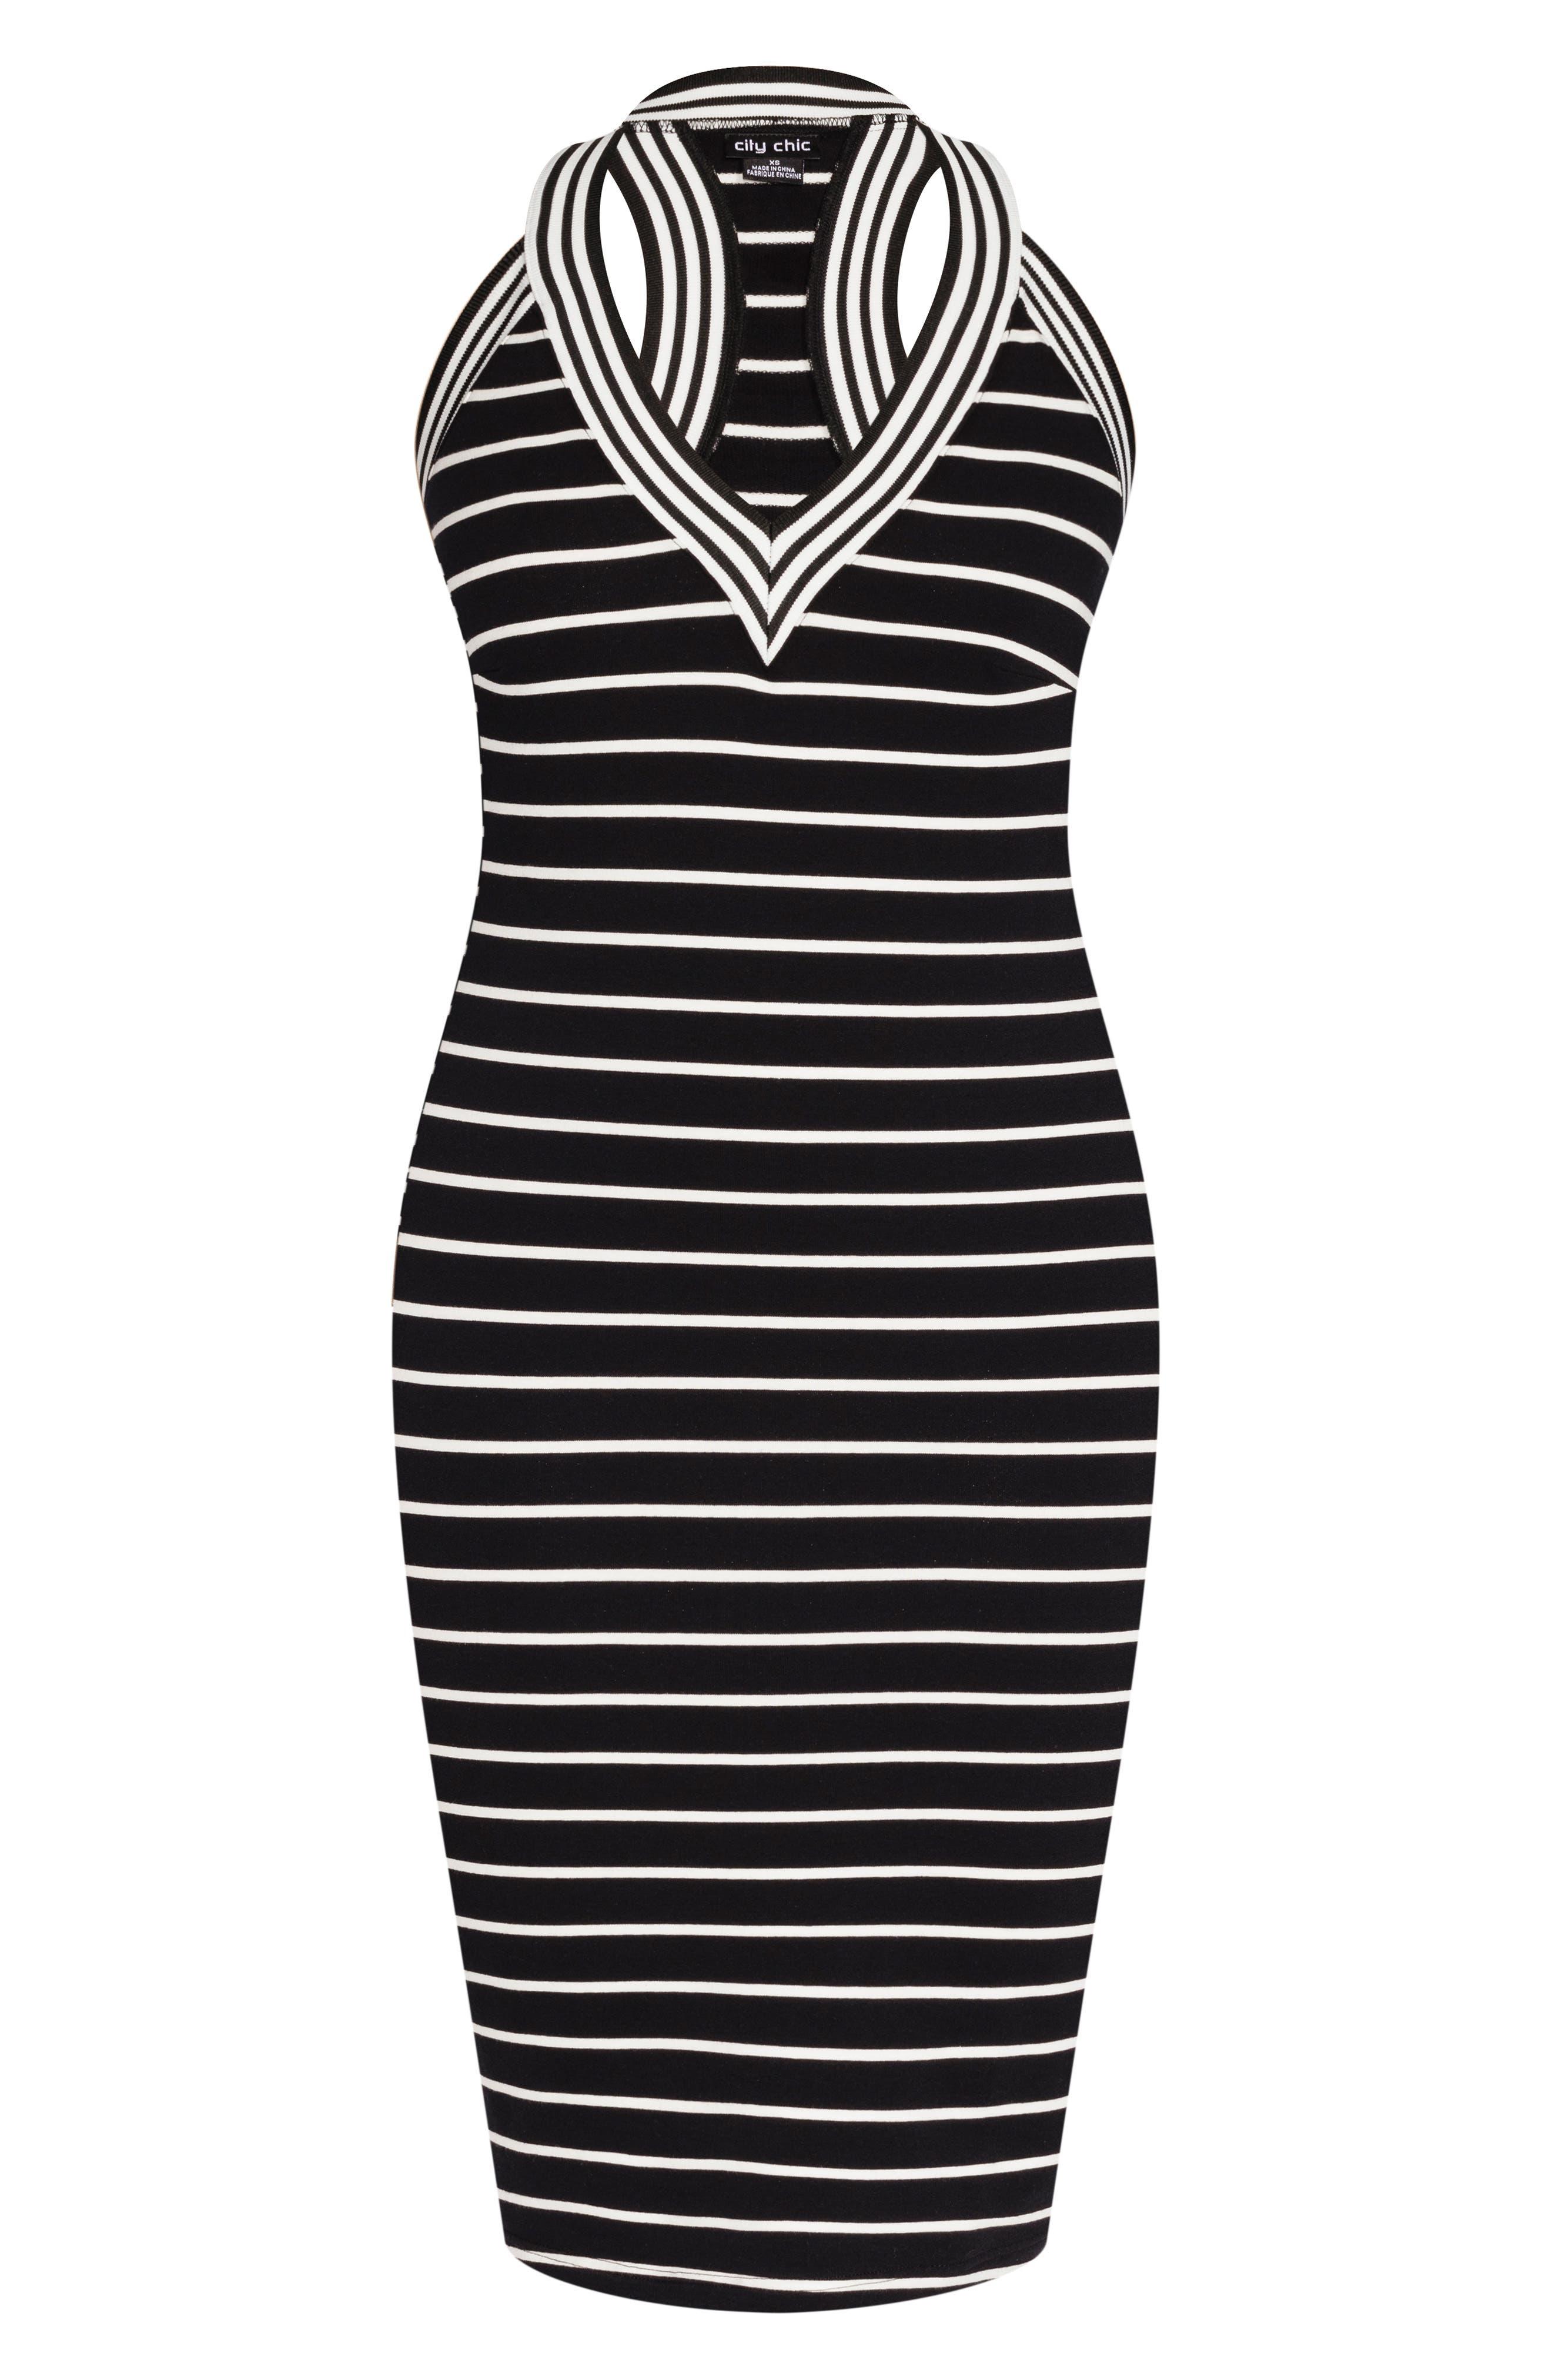 CITY CHIC, Stripe Racerback Dress, Alternate thumbnail 3, color, WHITE STRIPE